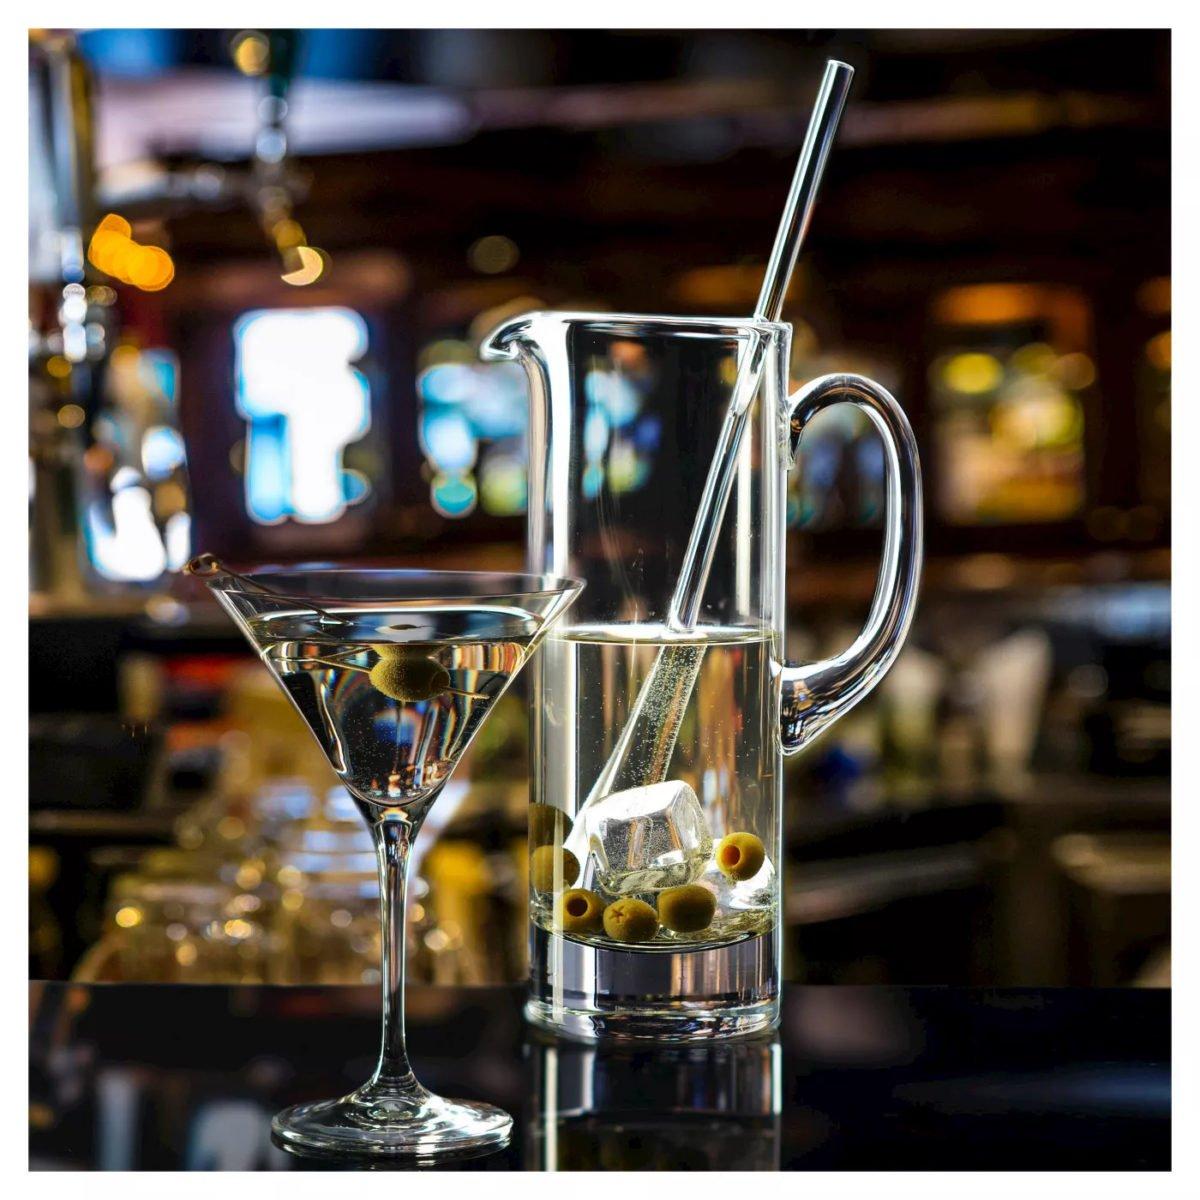 Krosno Handmade Glass Bond Martini Pitcher and Stirrer - 30oz